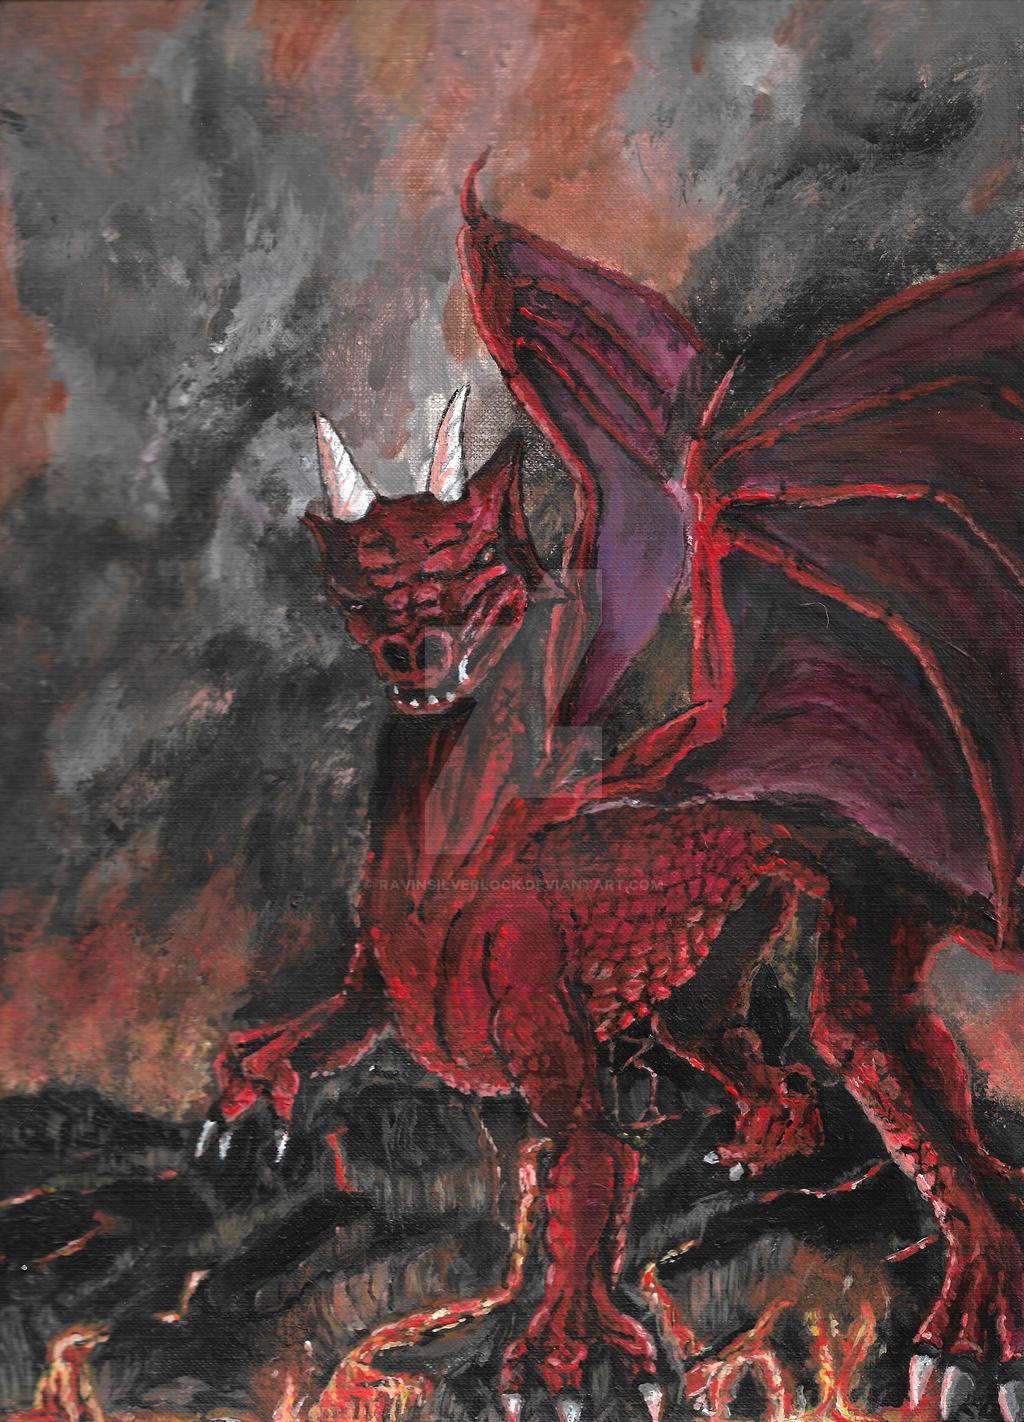 Rage of the Red Dragon by ravinsilverlock